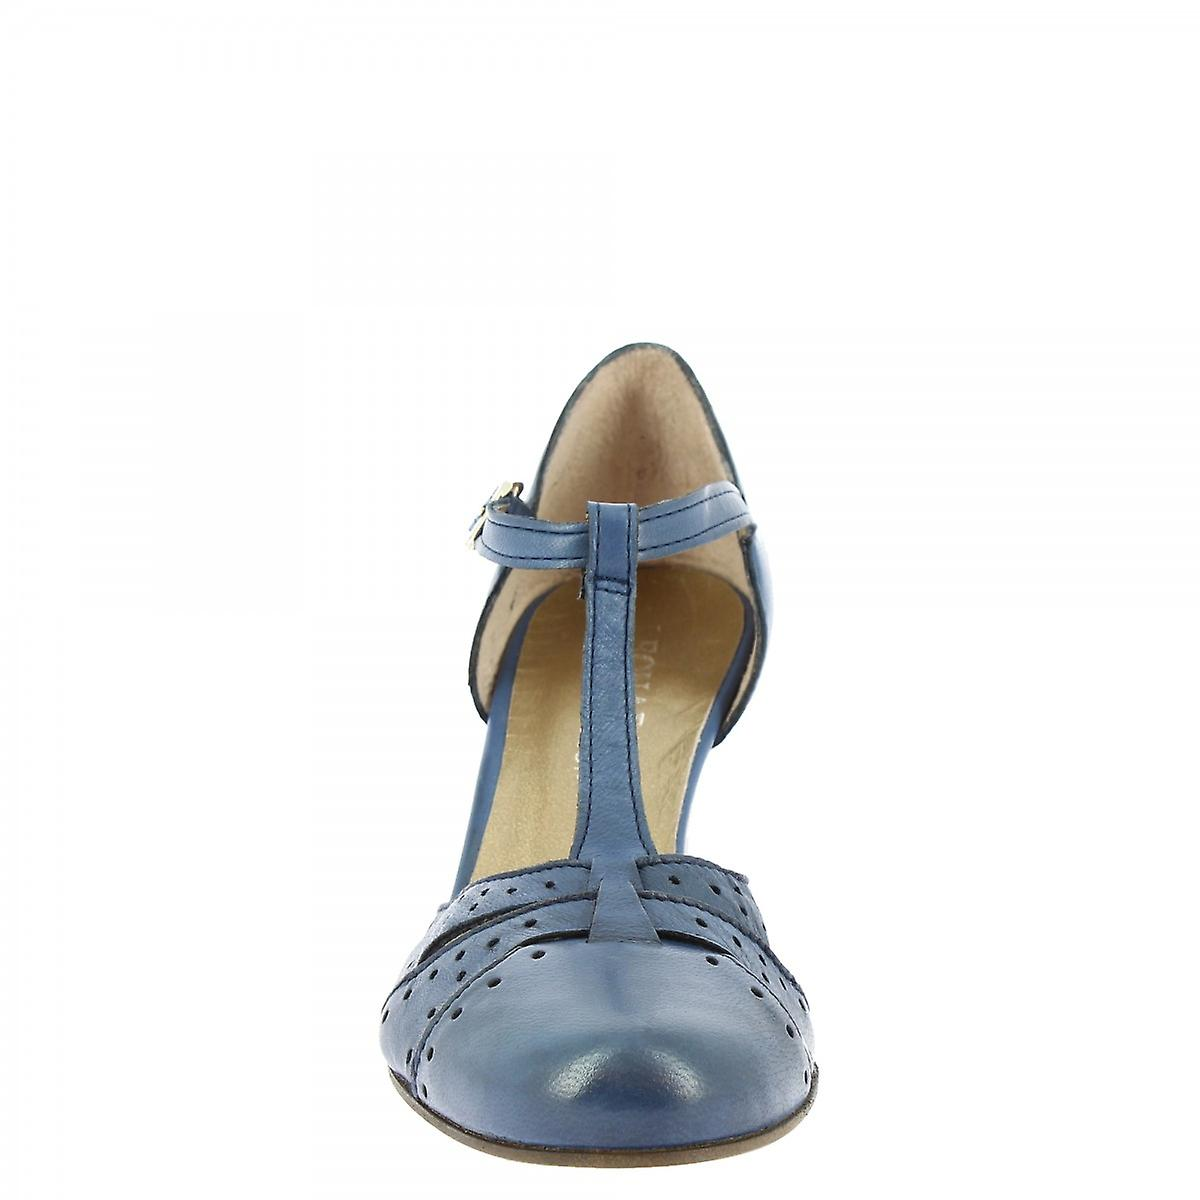 Leonardo Shoes Women-apos;s handmade dance mid heels pumps blue napa leather